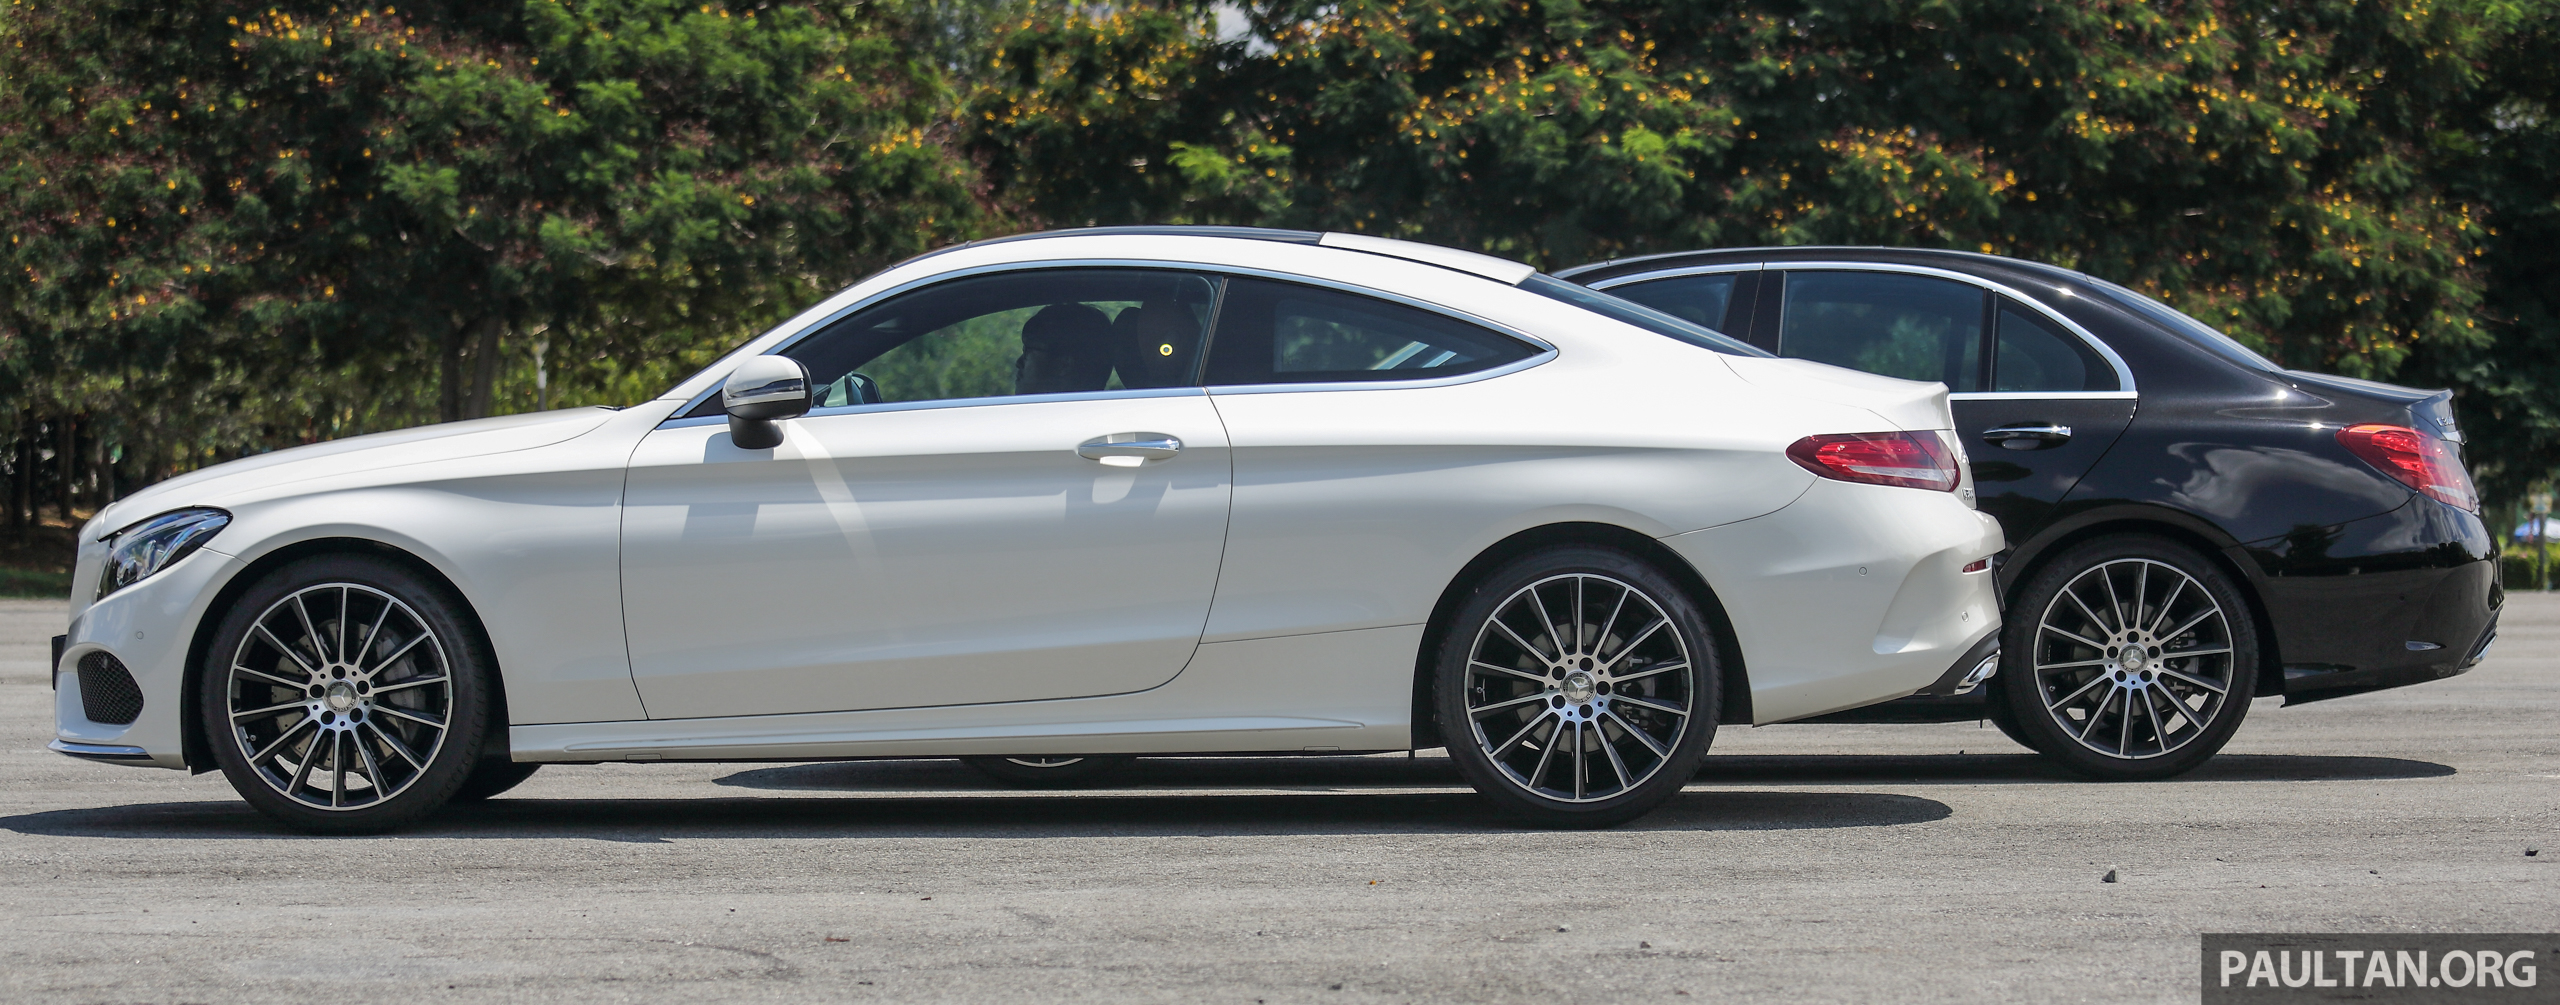 Sedan Vs Coupe >> GALLERY: Mercedes-Benz C300 Coupe vs sedan Image 495925